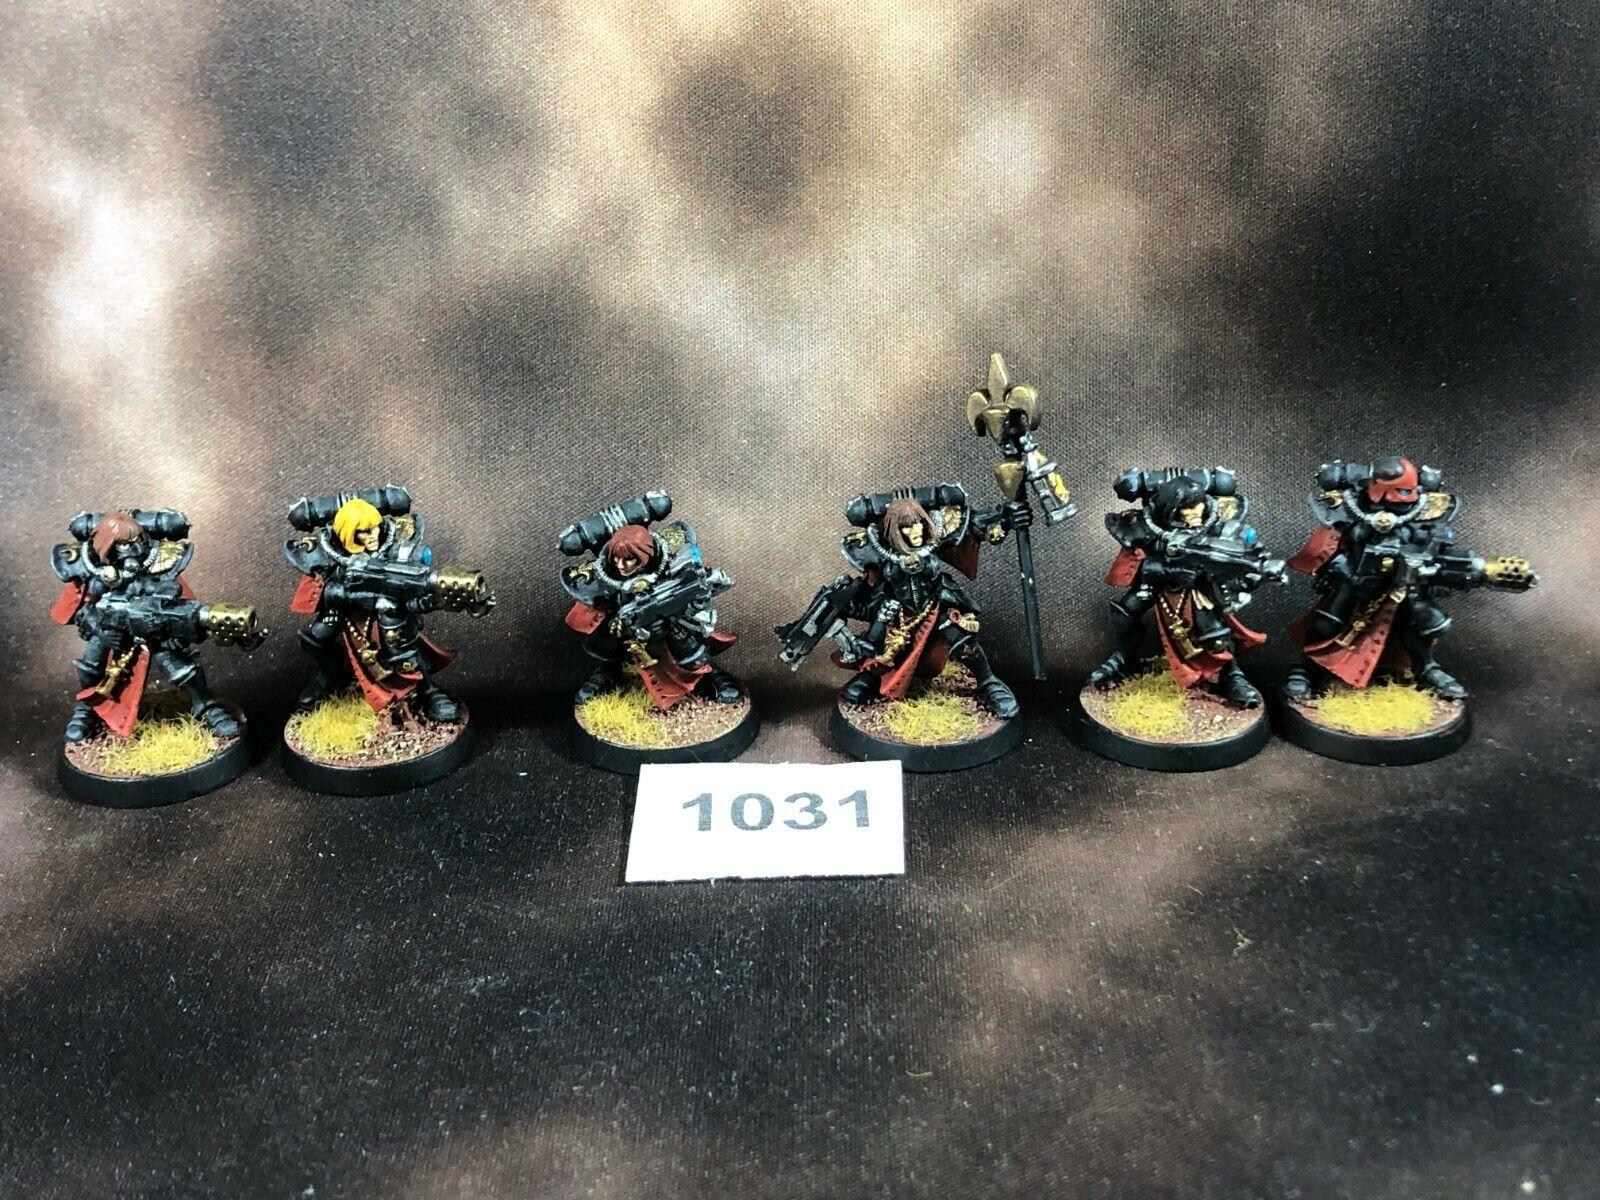 Warhammer 40k Soeurs de bataille Adeptus Sorritas METAL FLAMERS peint   magasin d'offre